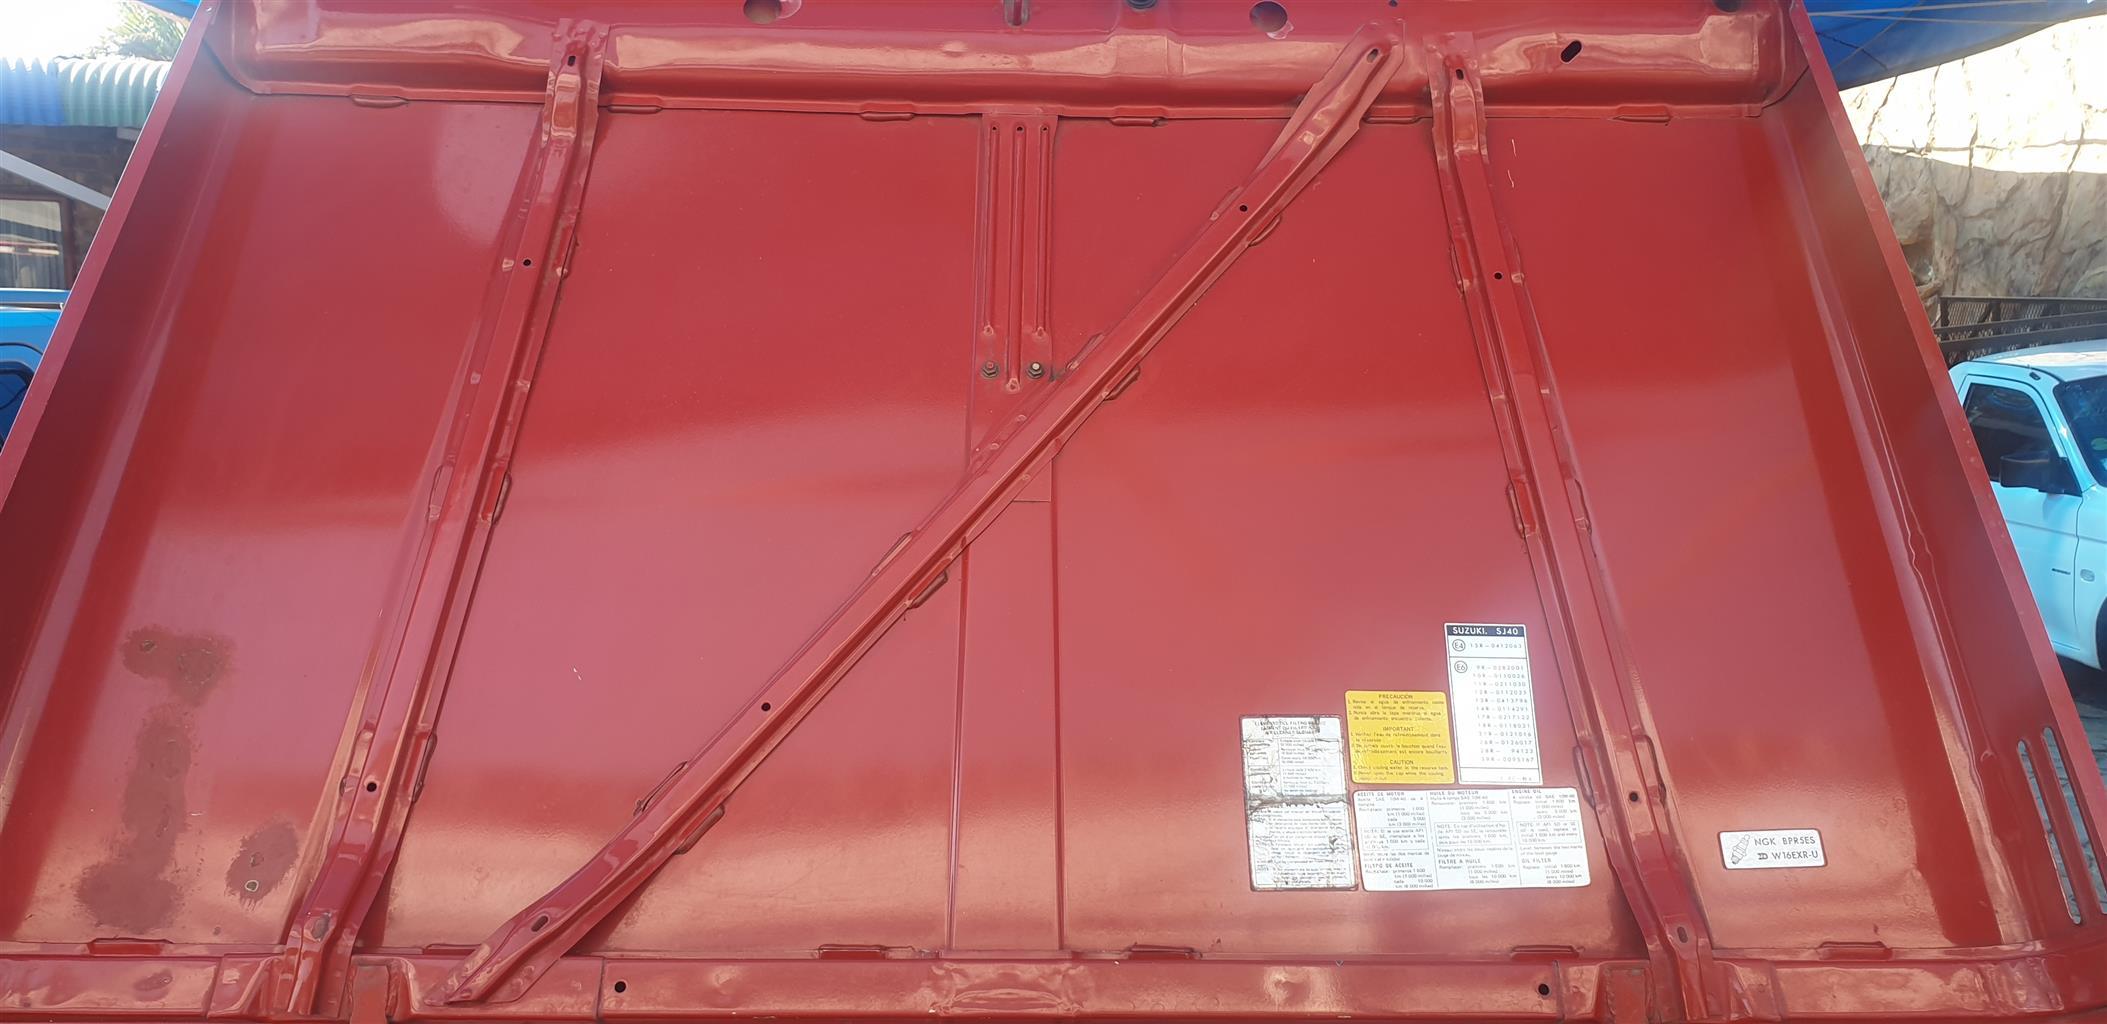 1983 Suzuki Jimny